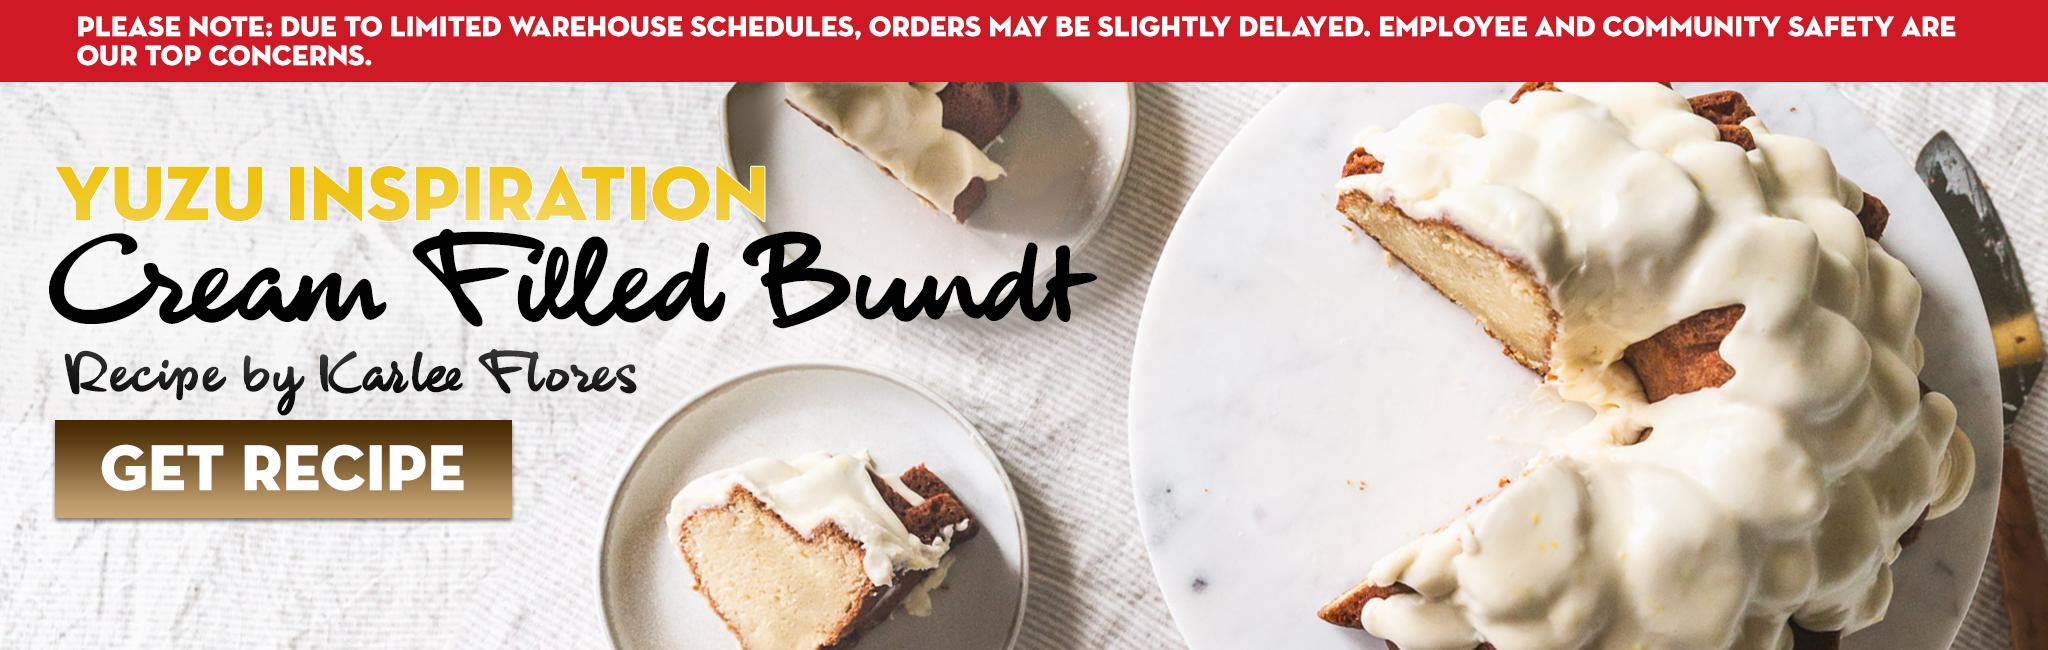 YUZU BUNDT CAKE RECIPE